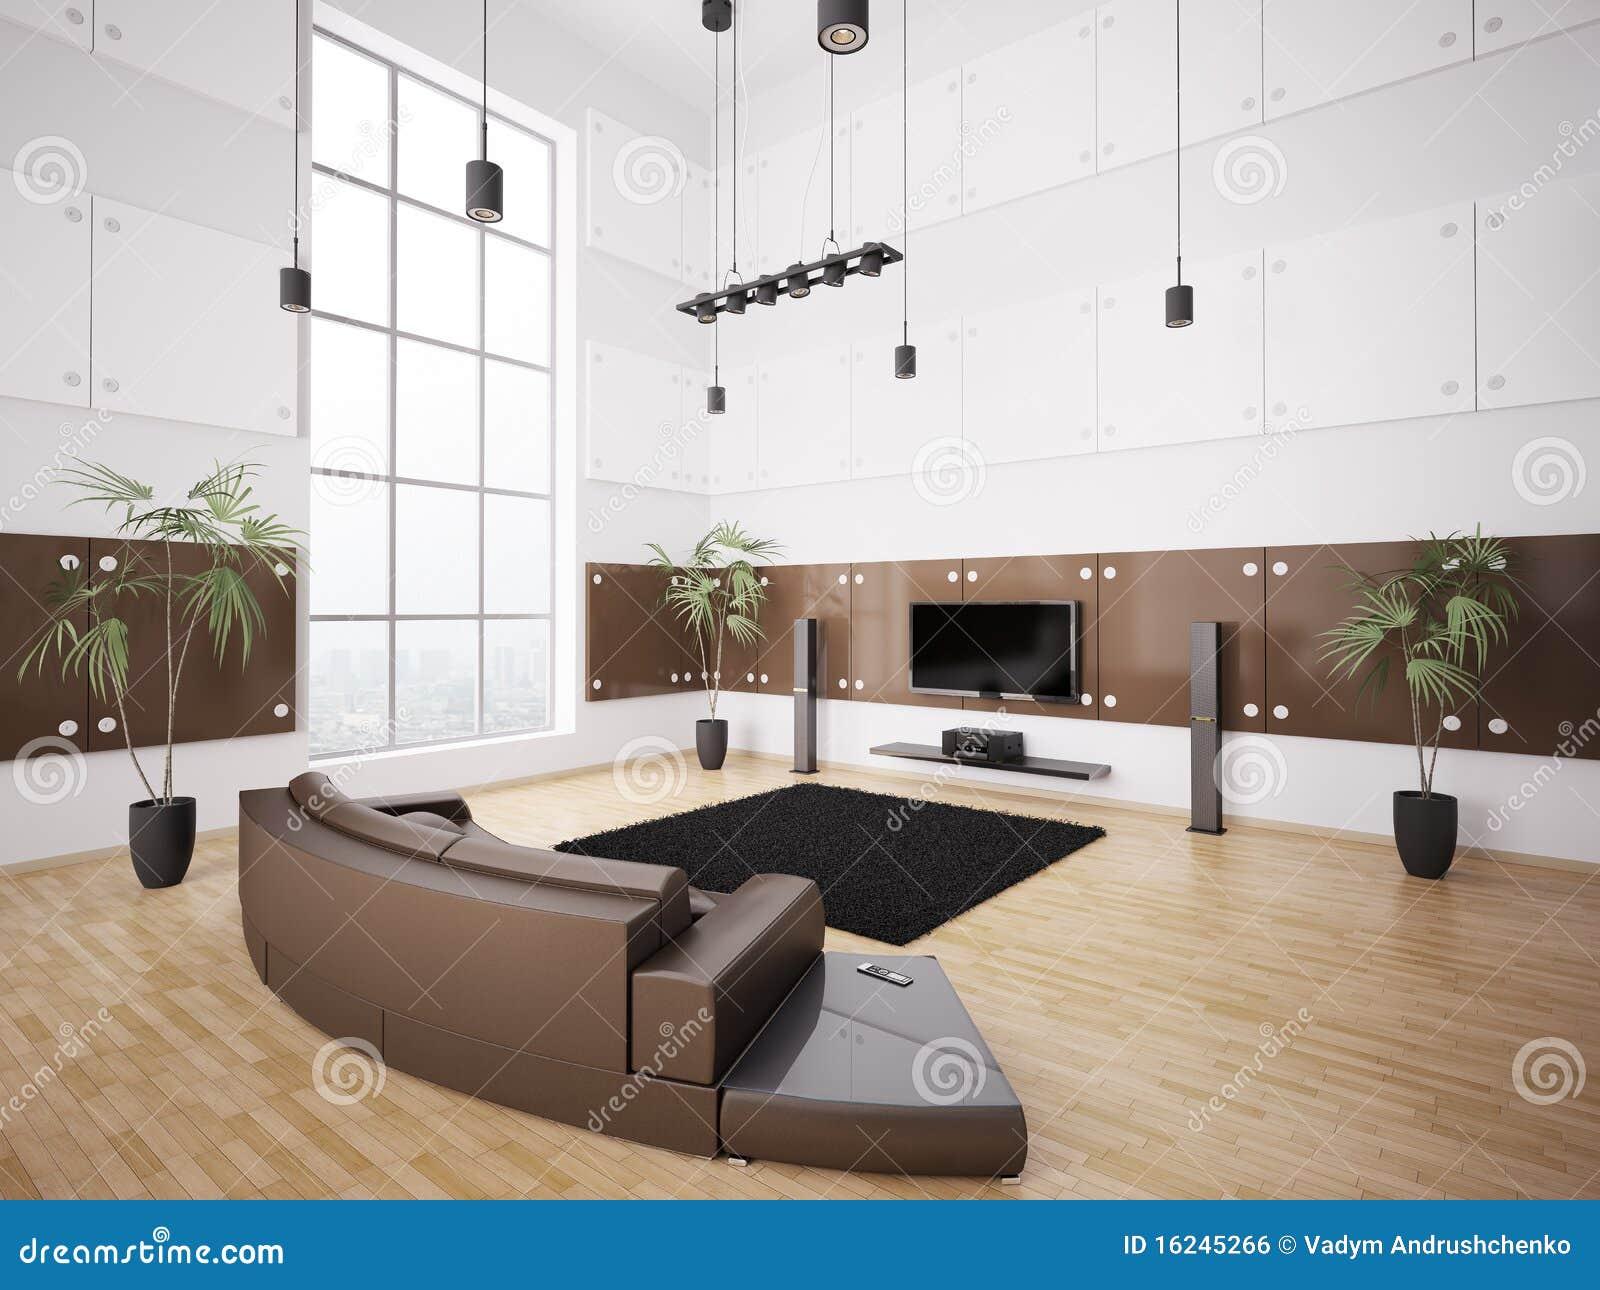 Modernes Wohnzimmer Innen3d Lizenzfreies Stockbild  Bild 16245266